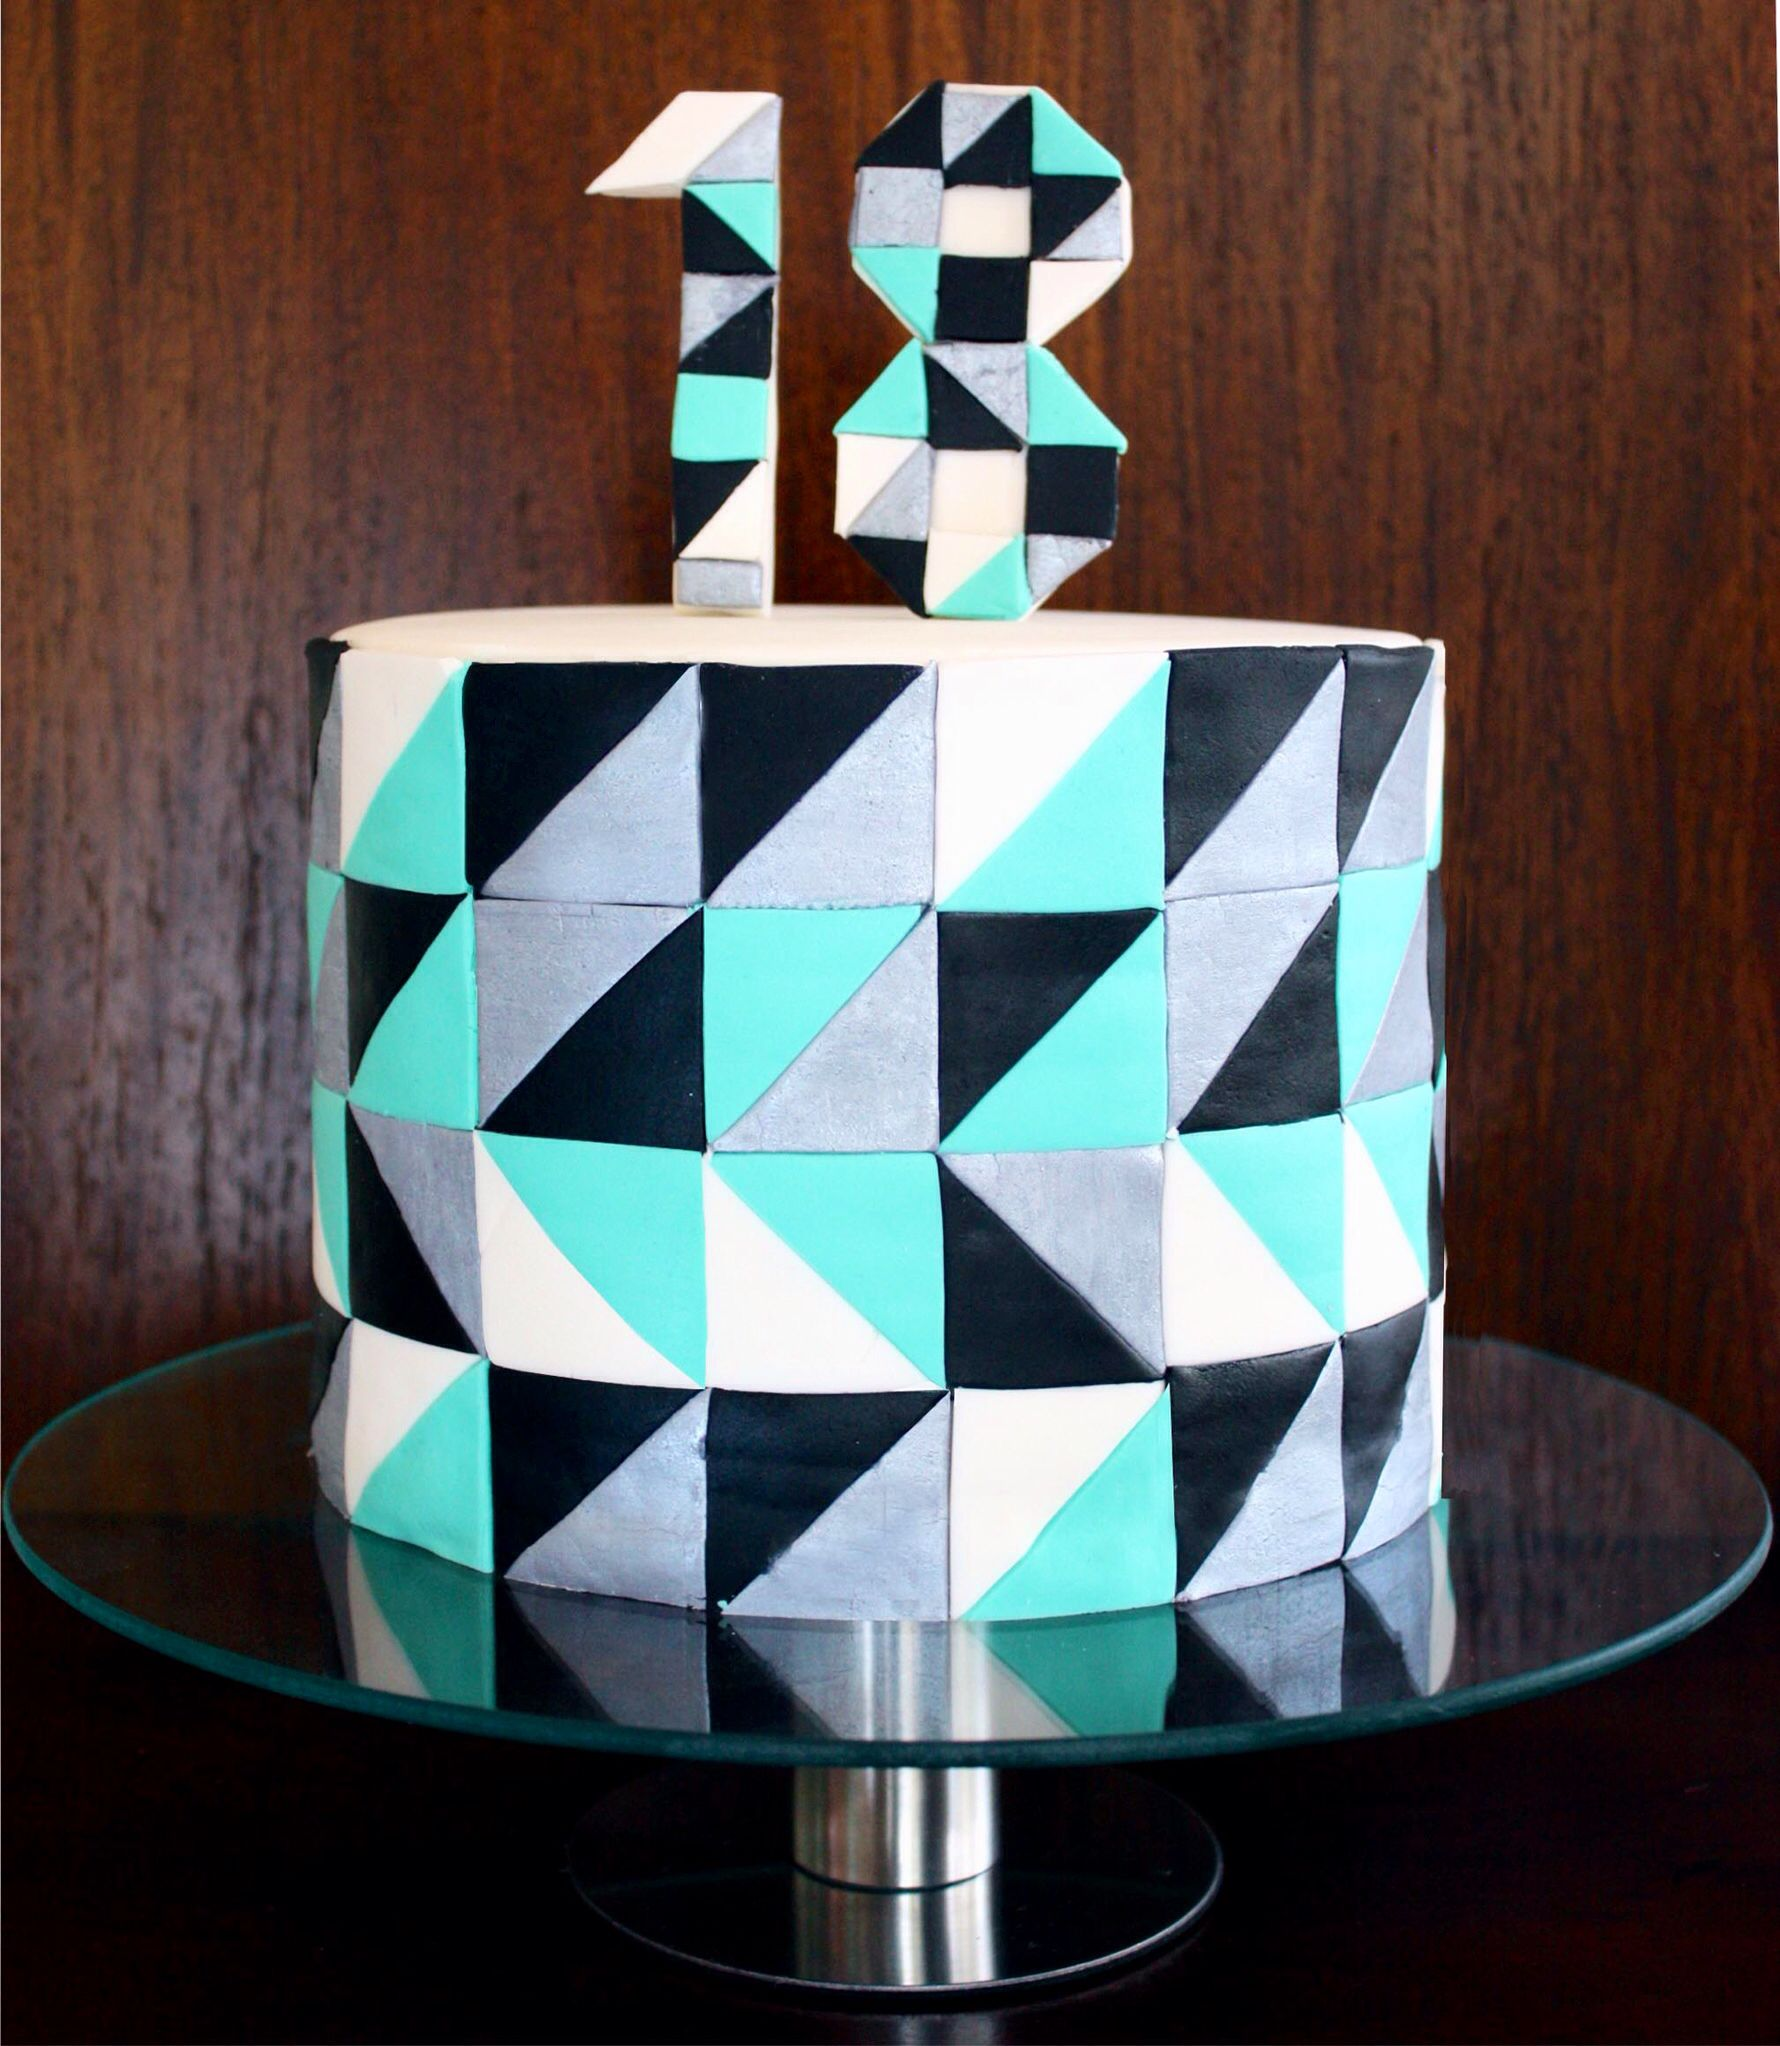 Mosaic Geometric Graphic Triangles 18th Male Birthday